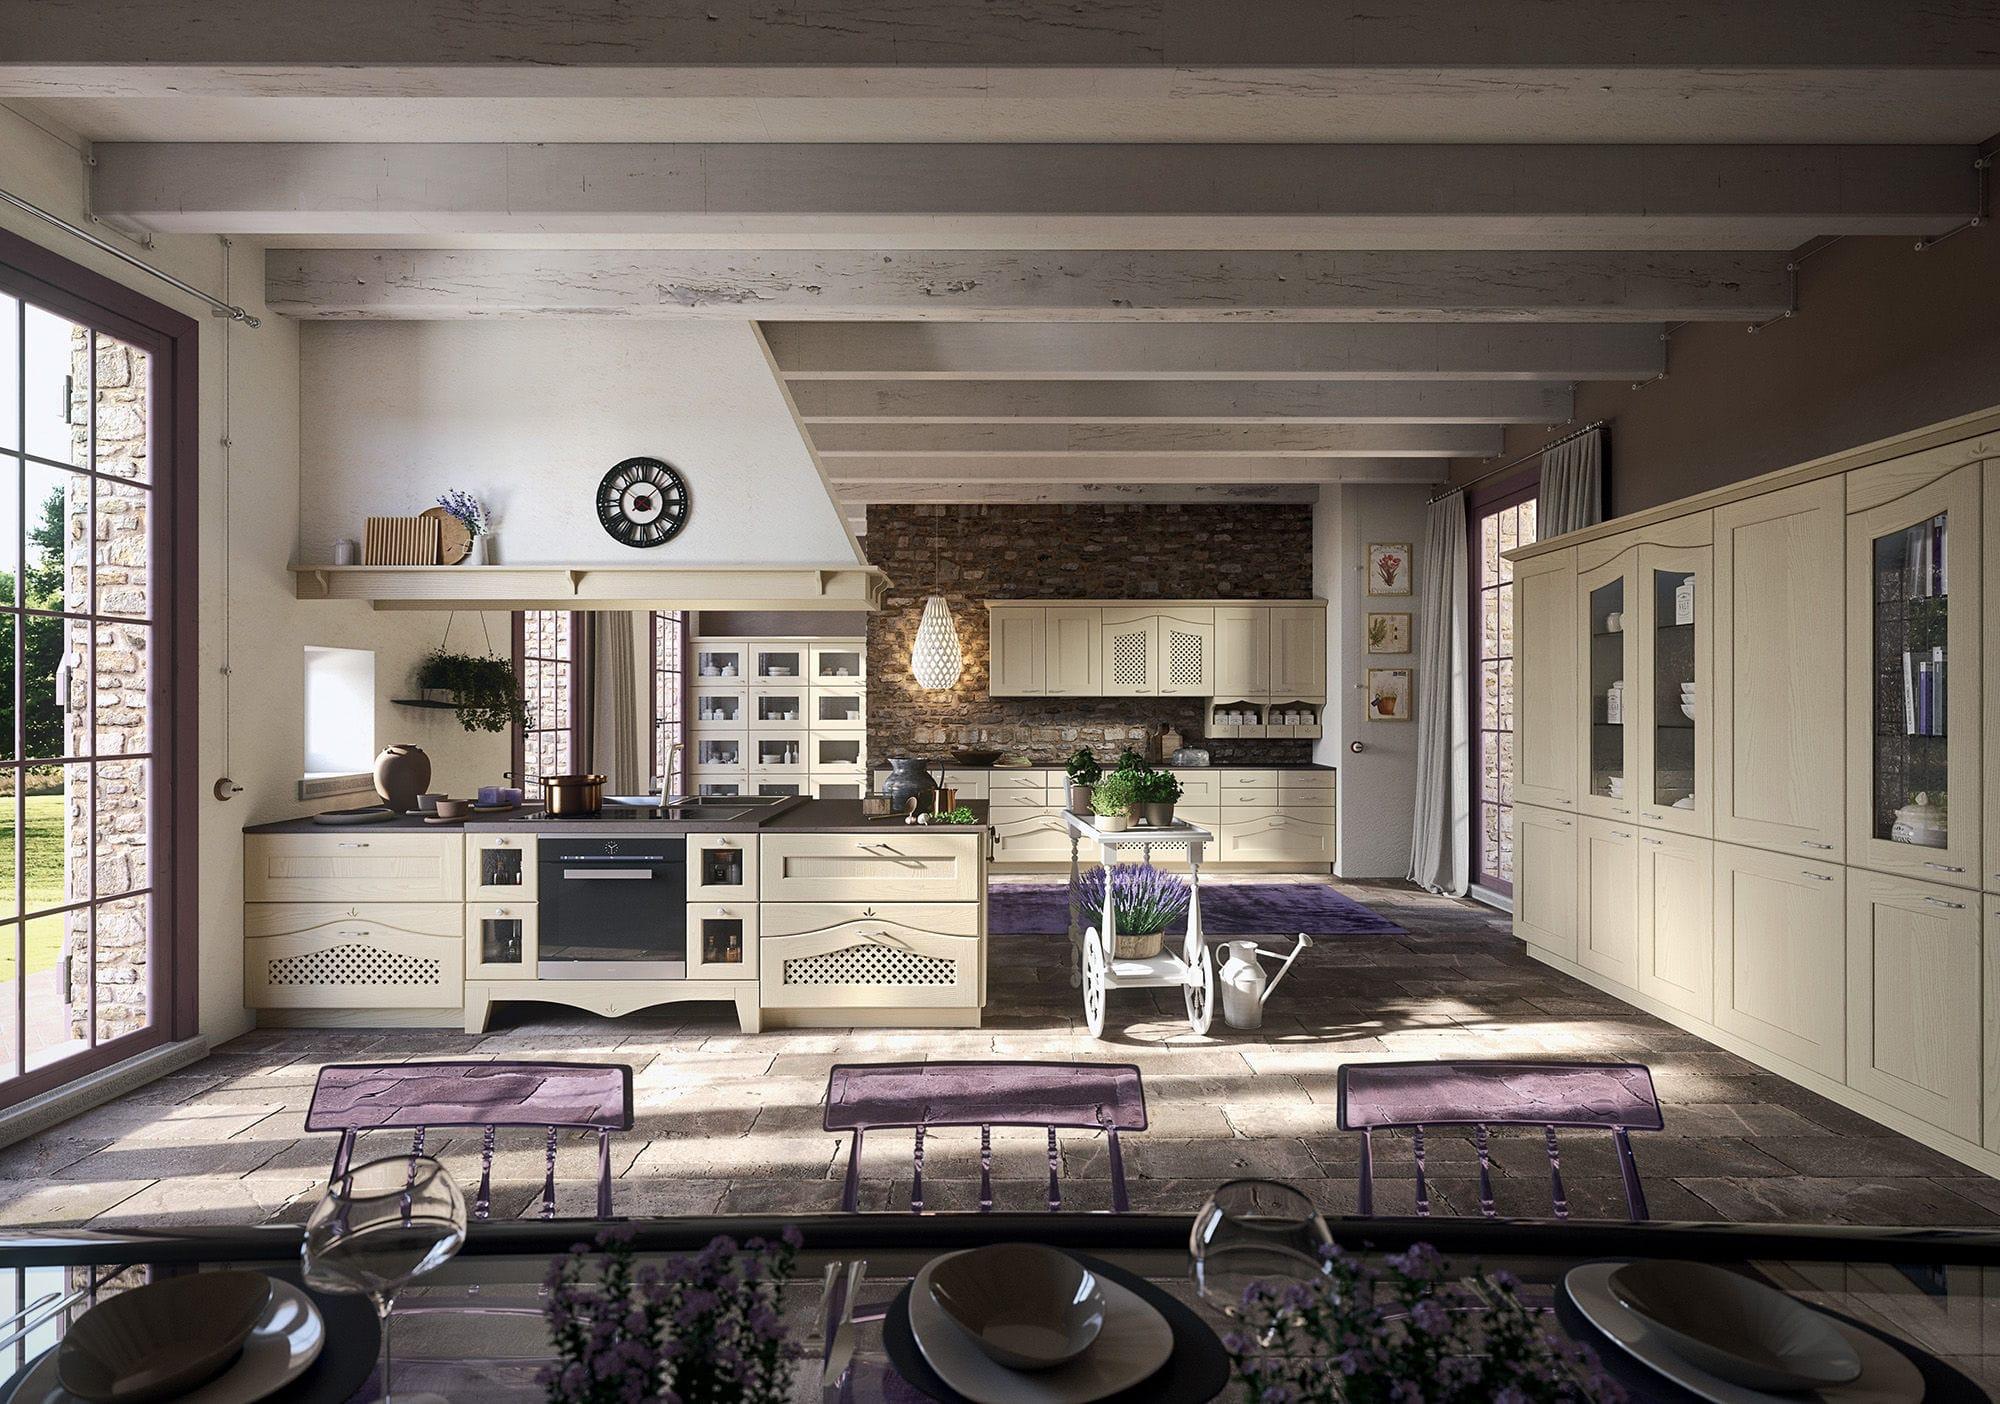 Cucina classica / in legno / con impugnature - DUCALE - Arrital